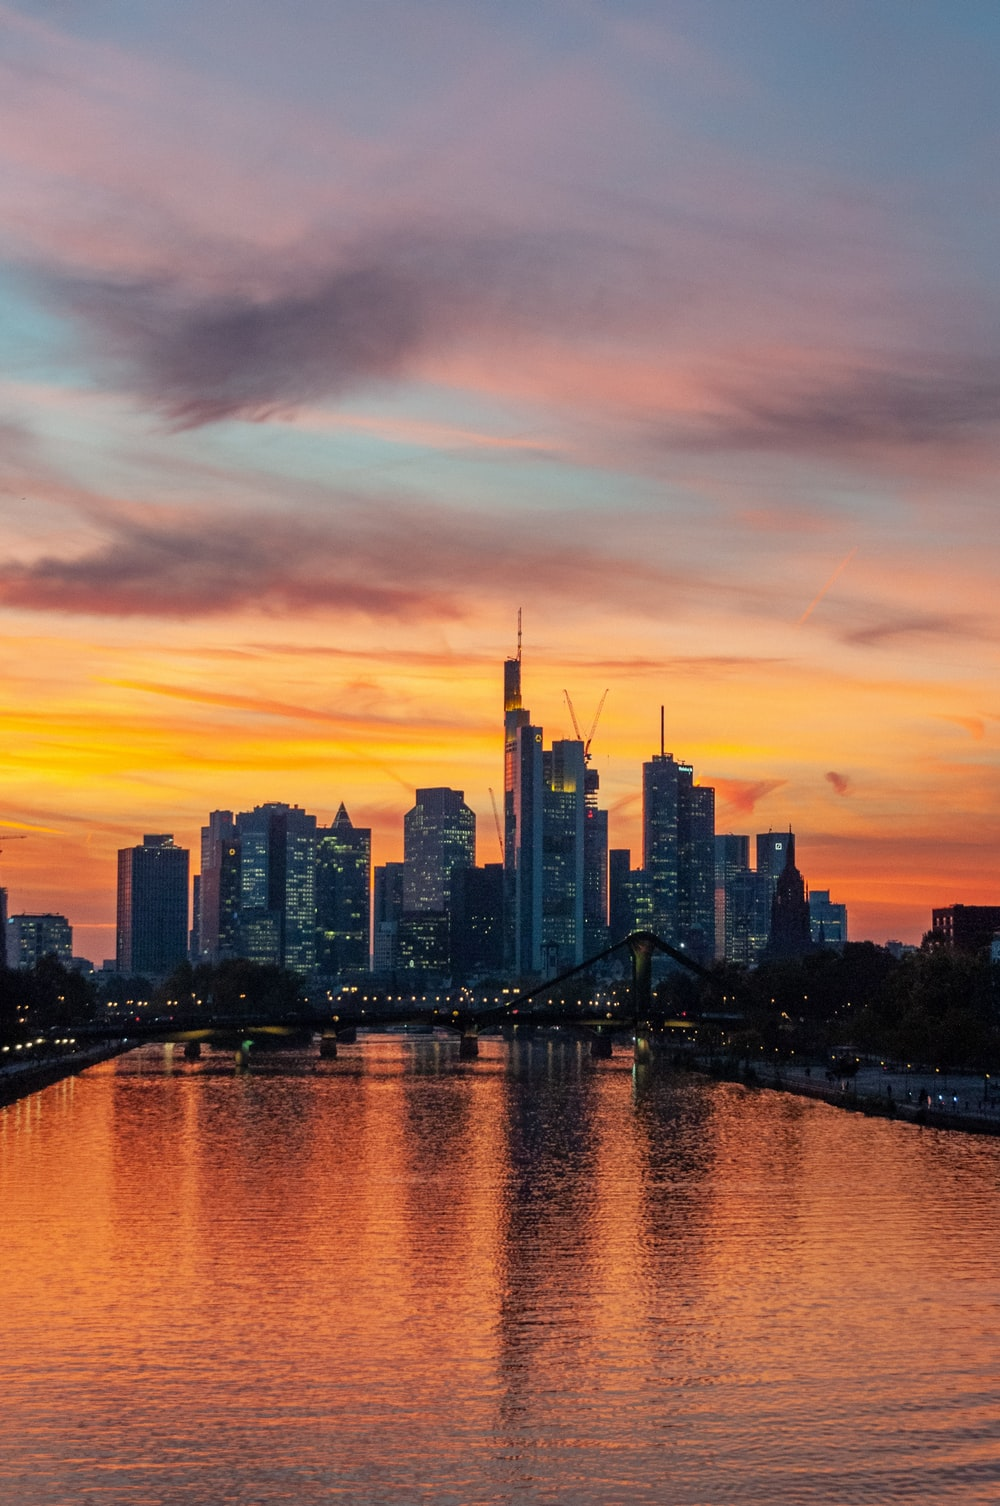 city skyline during sunset with bridge